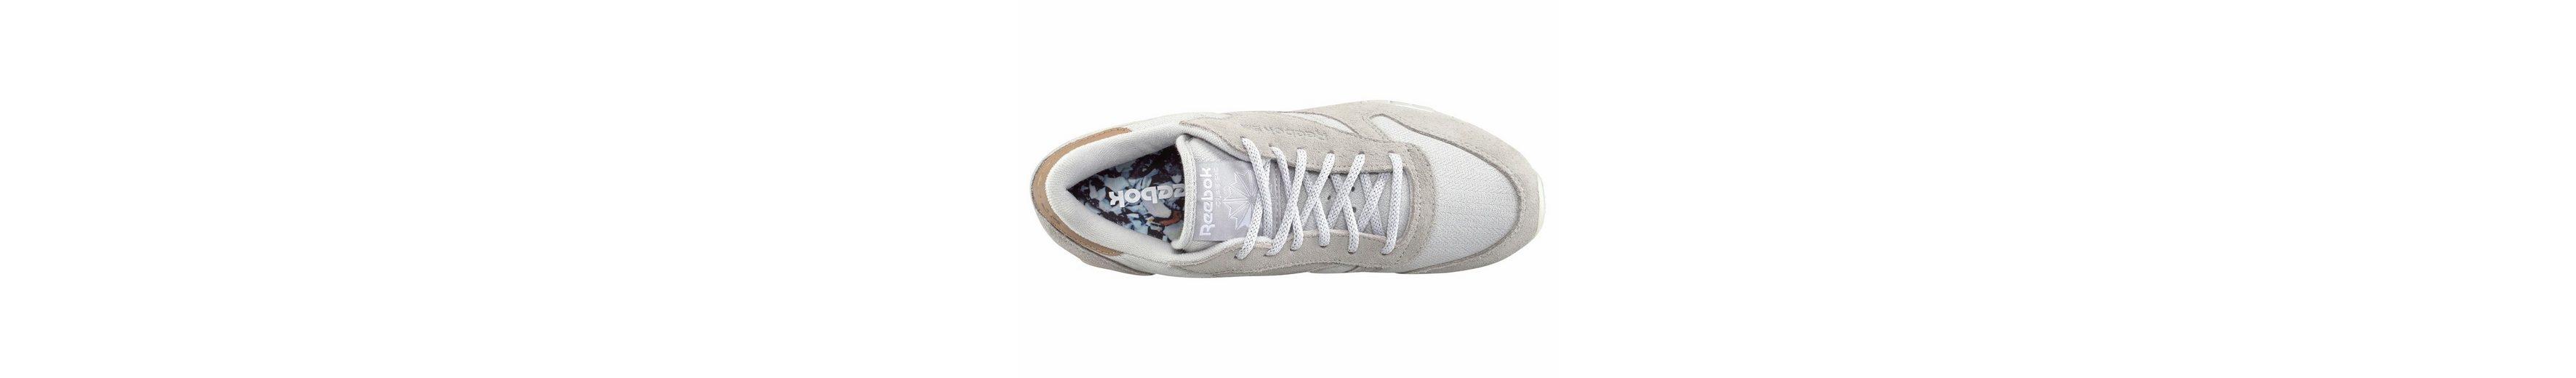 Reebok Classic Classic Leather Sea-Worn Sneaker Spielraum xqiag